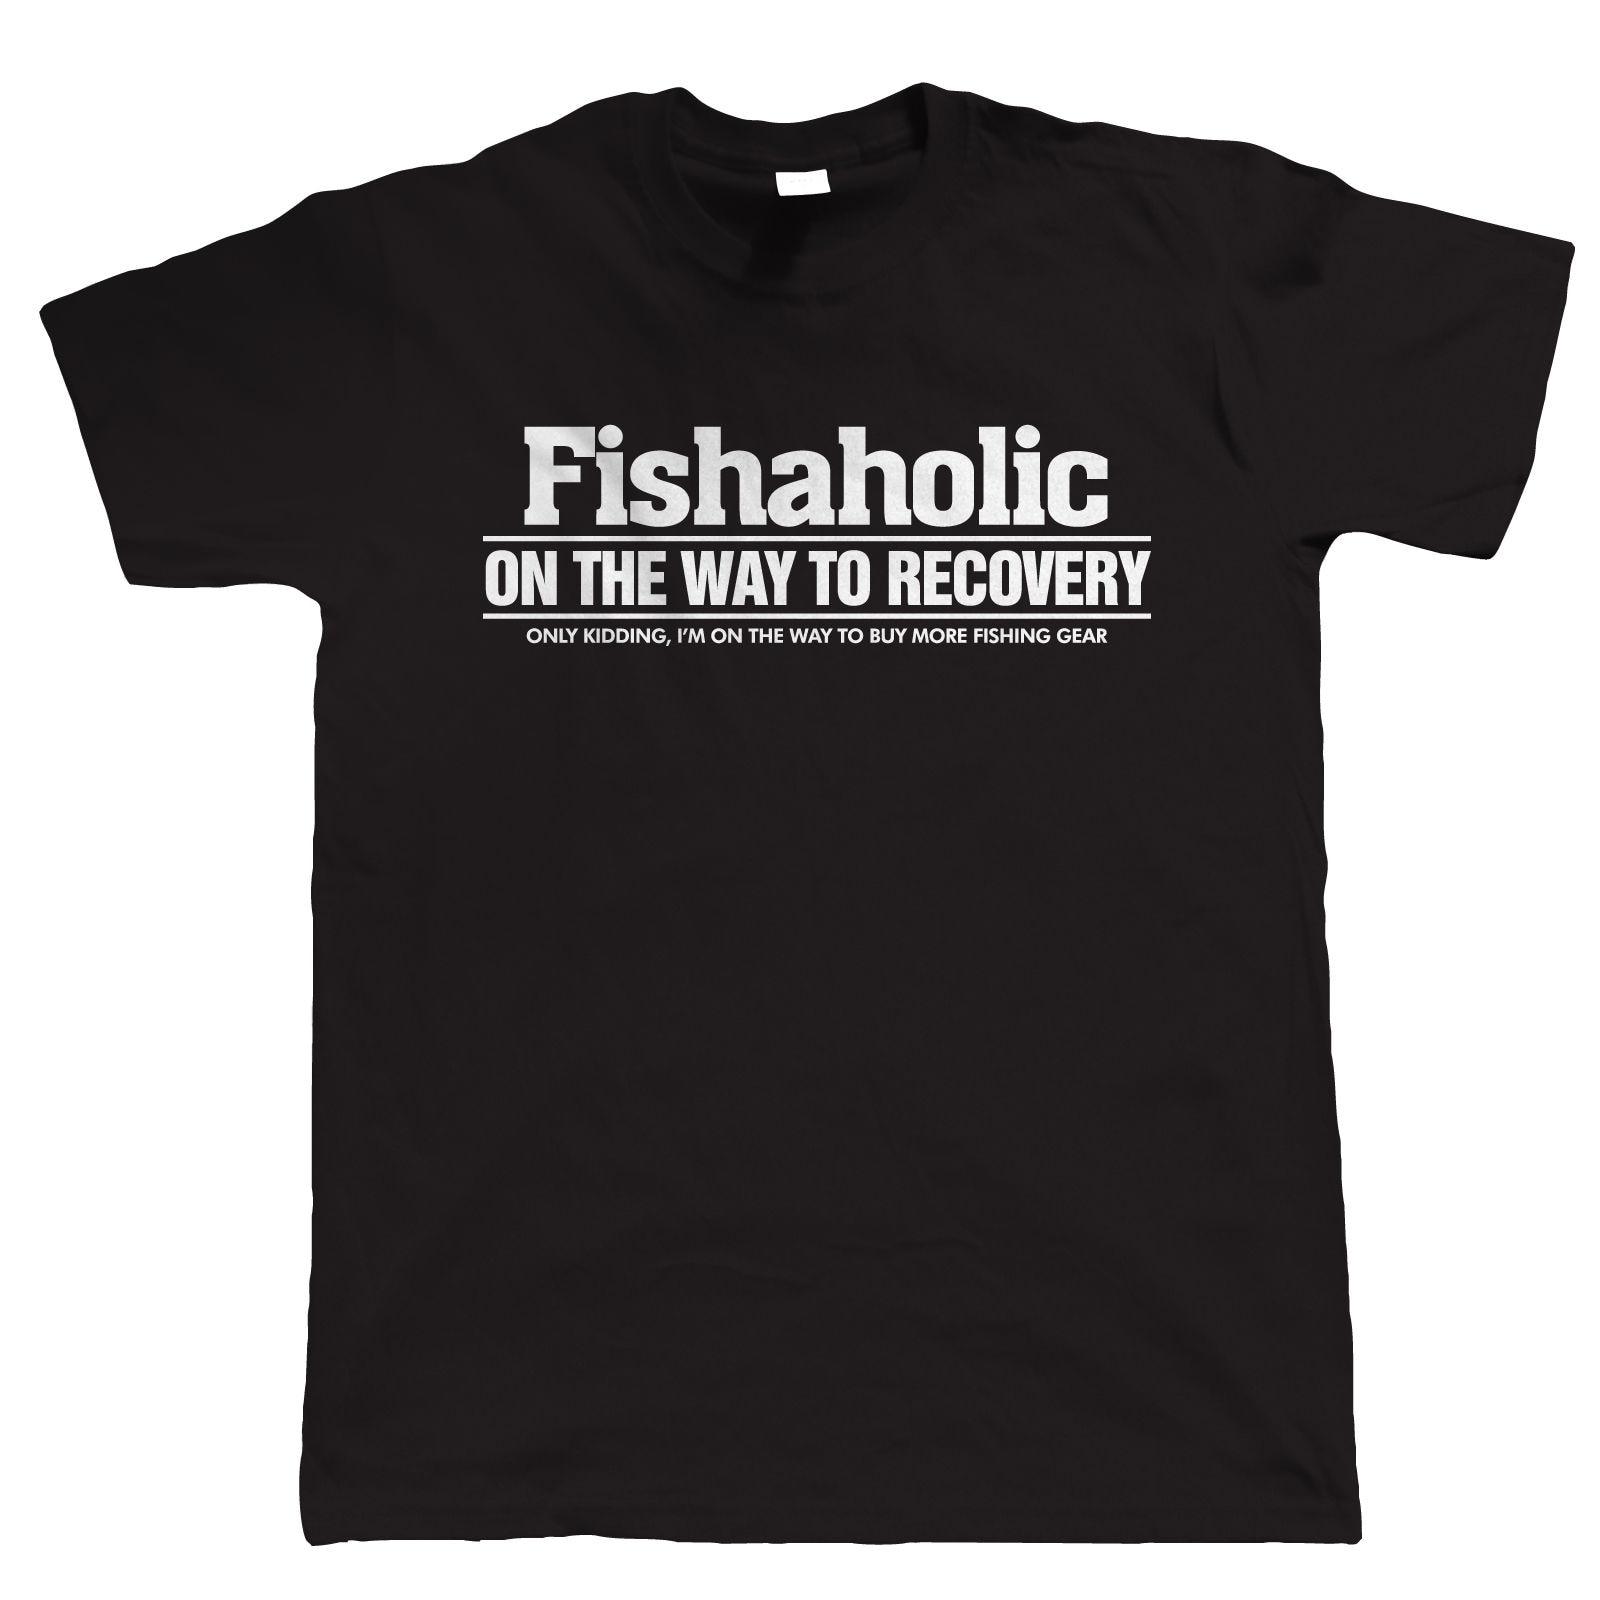 Summer Sleeves T Shirt Fashion Fisheraholic Fishinger Tdad Fathers Day Short Sleeve For Men